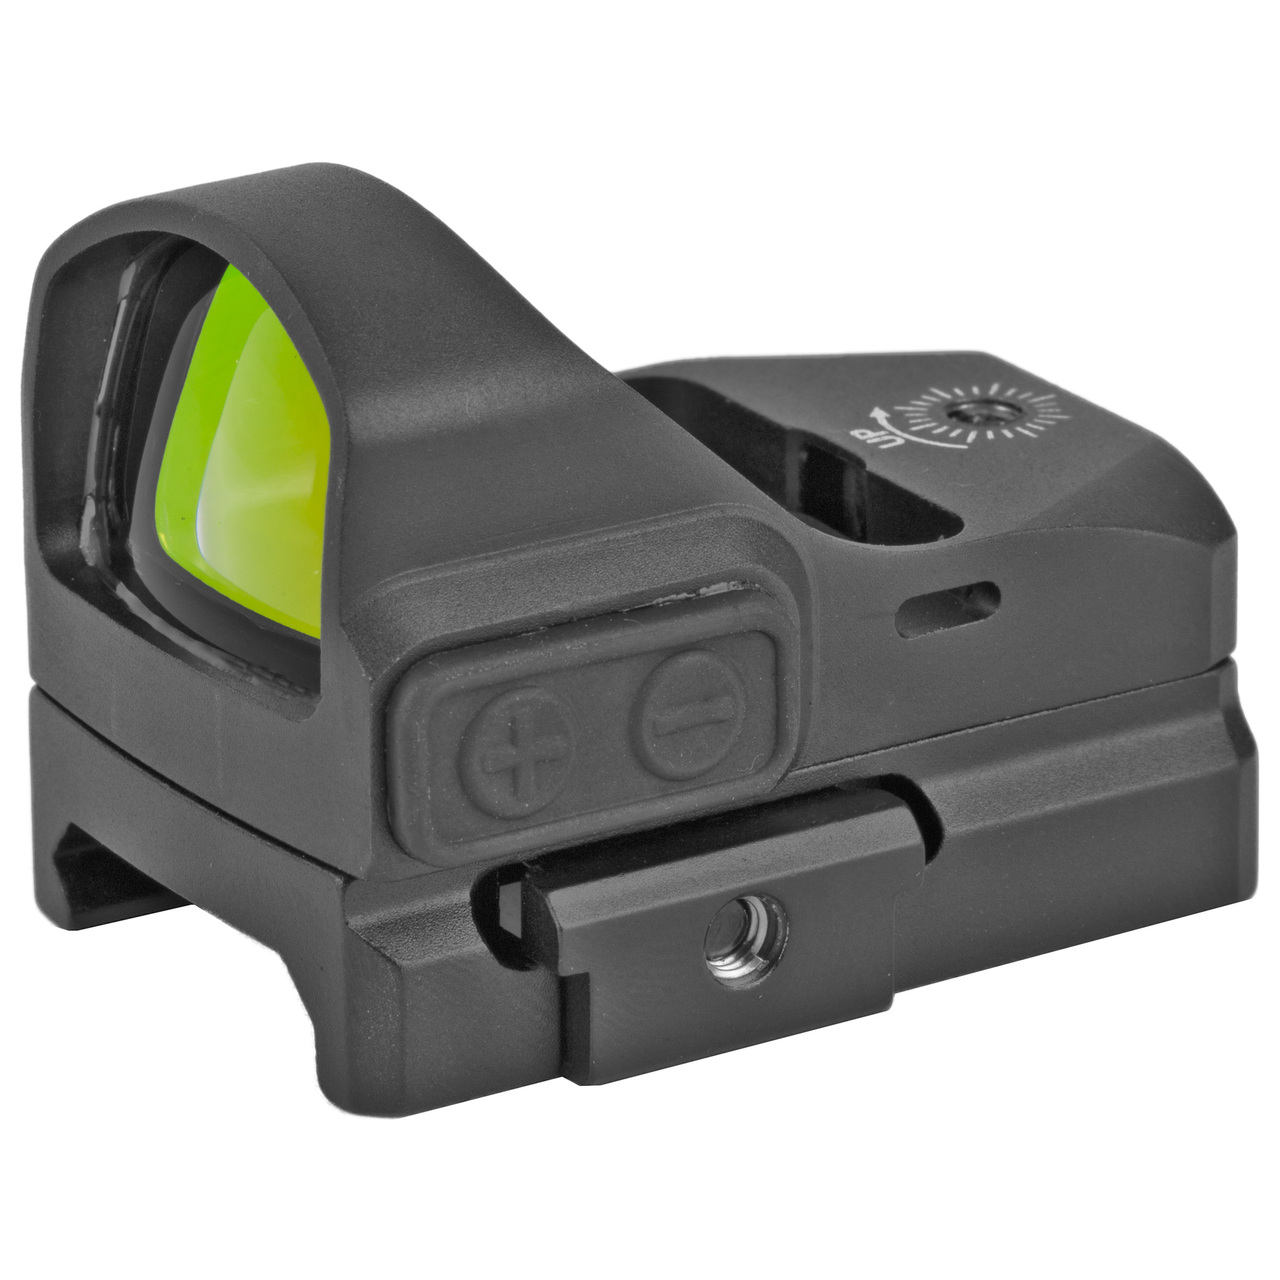 Truglo Tru-Tec 23mm Micro Red Dot